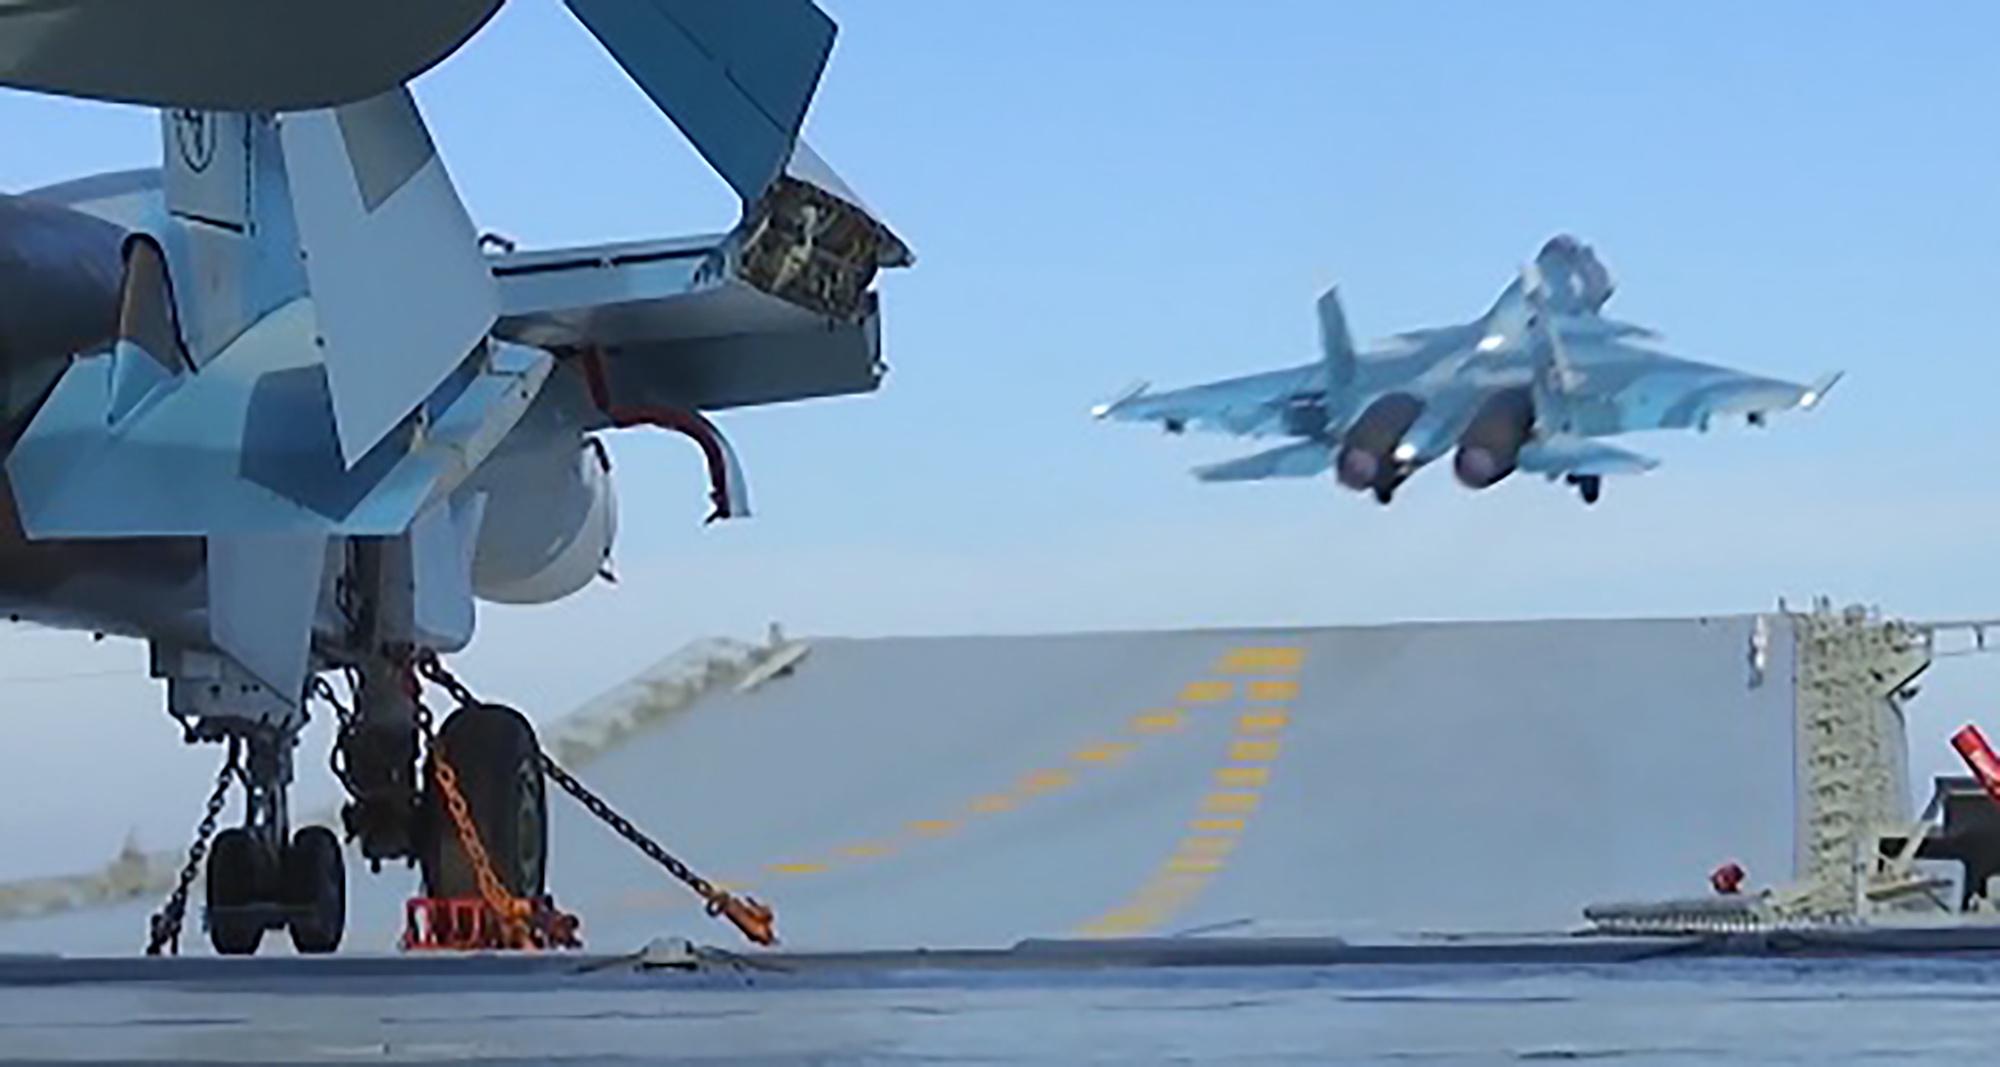 Almirante Kuznetsov e o alto custo para reconquistar Aleppo